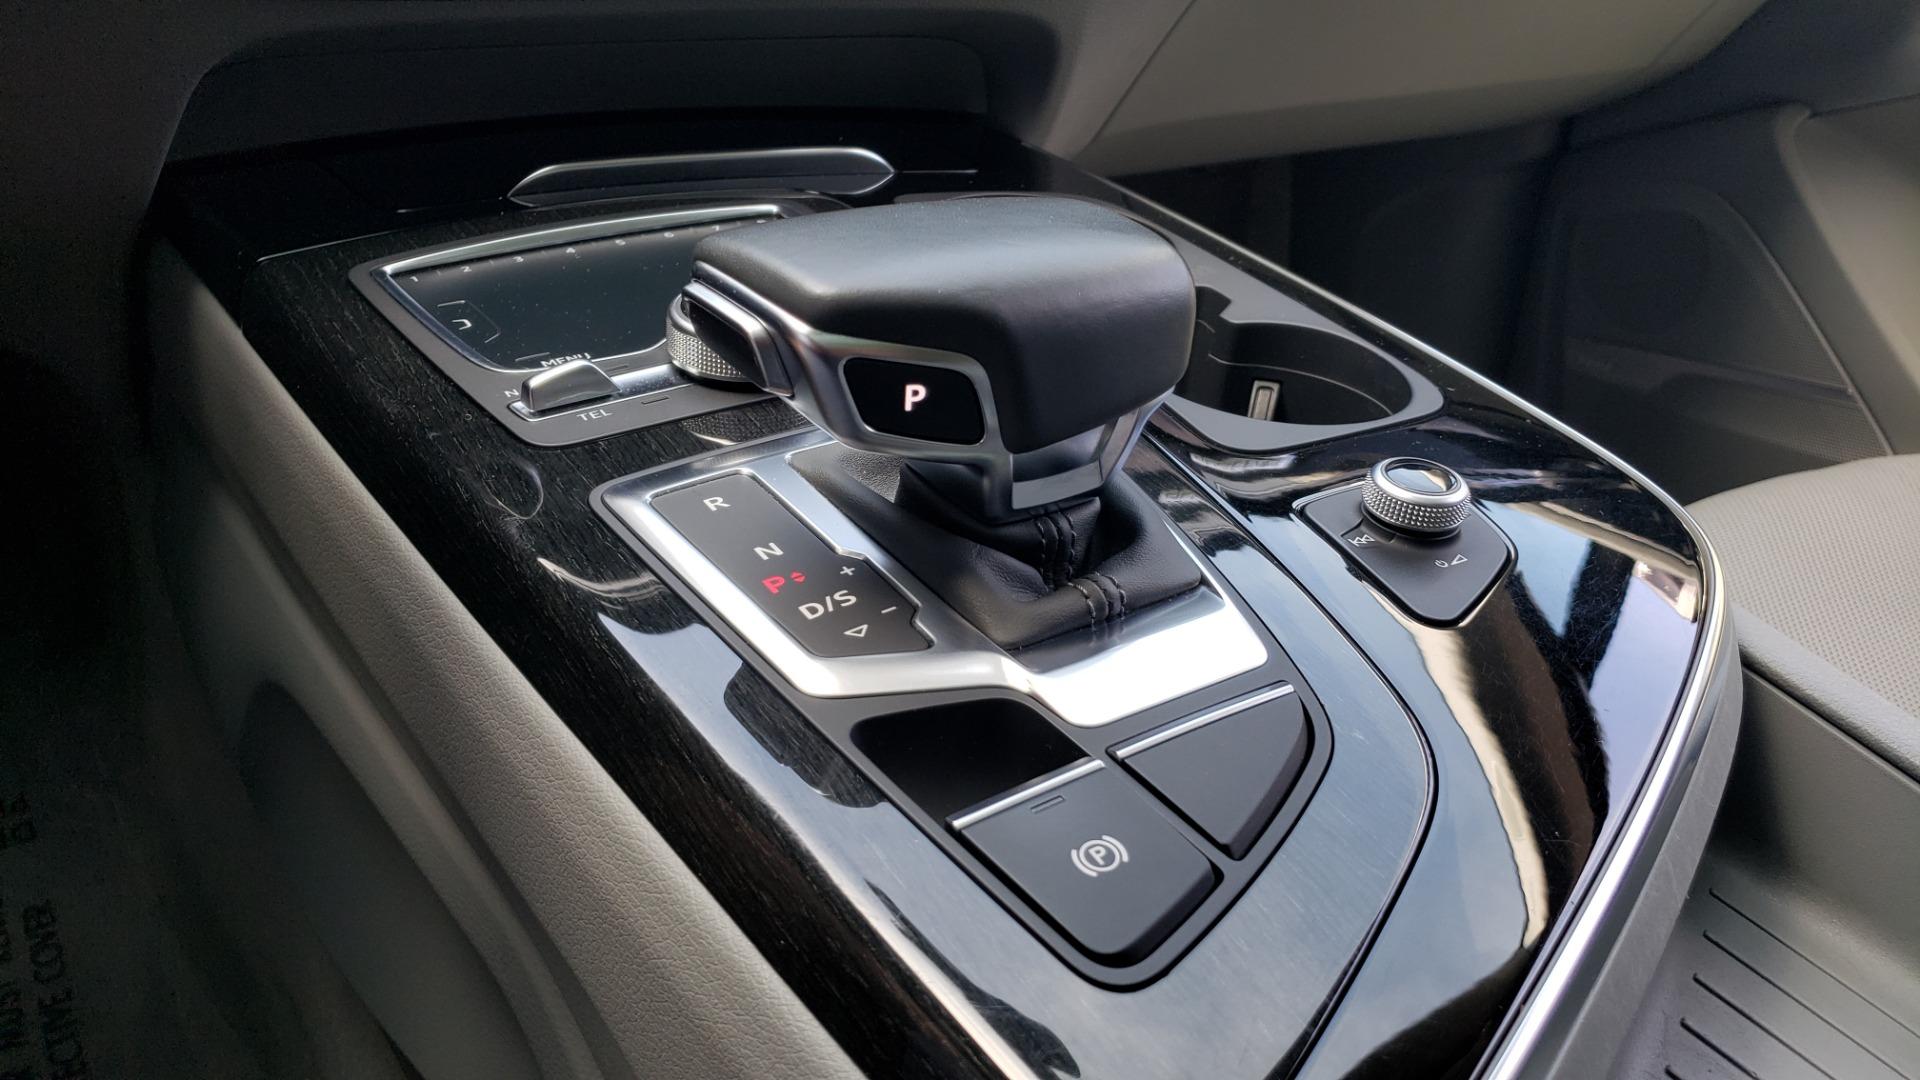 Used 2018 Audi Q7 PRESTIGE TIPTRONIC / NAV / SUNROOF / ADAPTIVE PKG / DRVR ASST / CLD WTHR /  for sale $49,995 at Formula Imports in Charlotte NC 28227 48